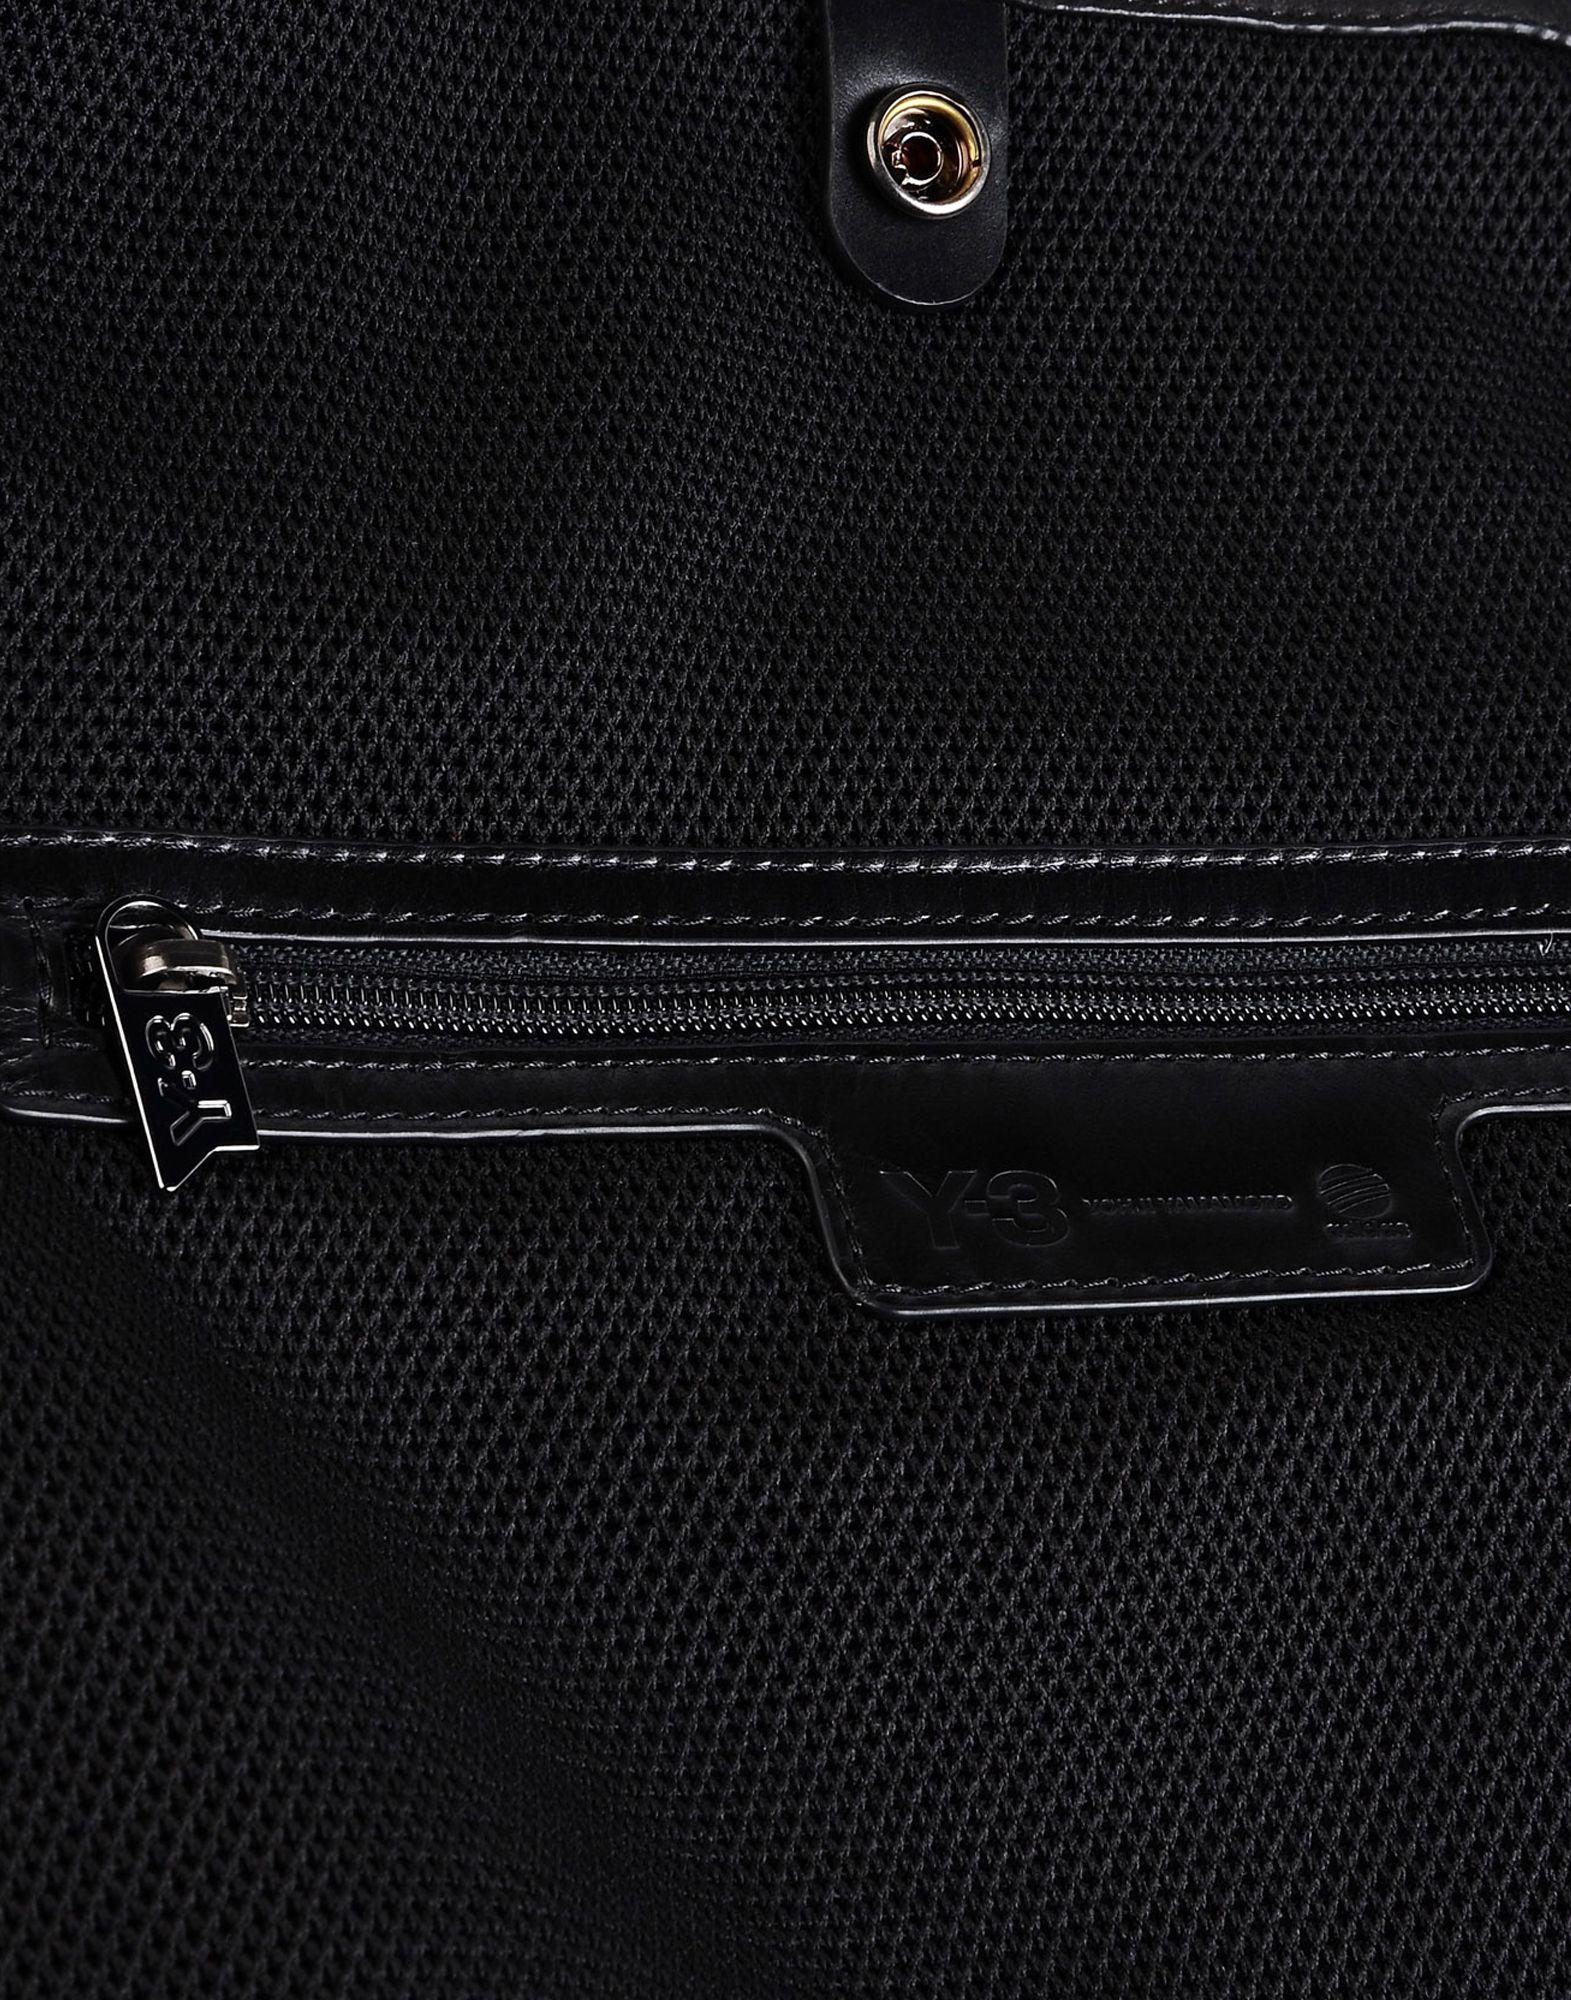 Y-3 Y-3 Toile Lthr Shldr Bag Large leather bag Woman e ... 09198ea34ab5f